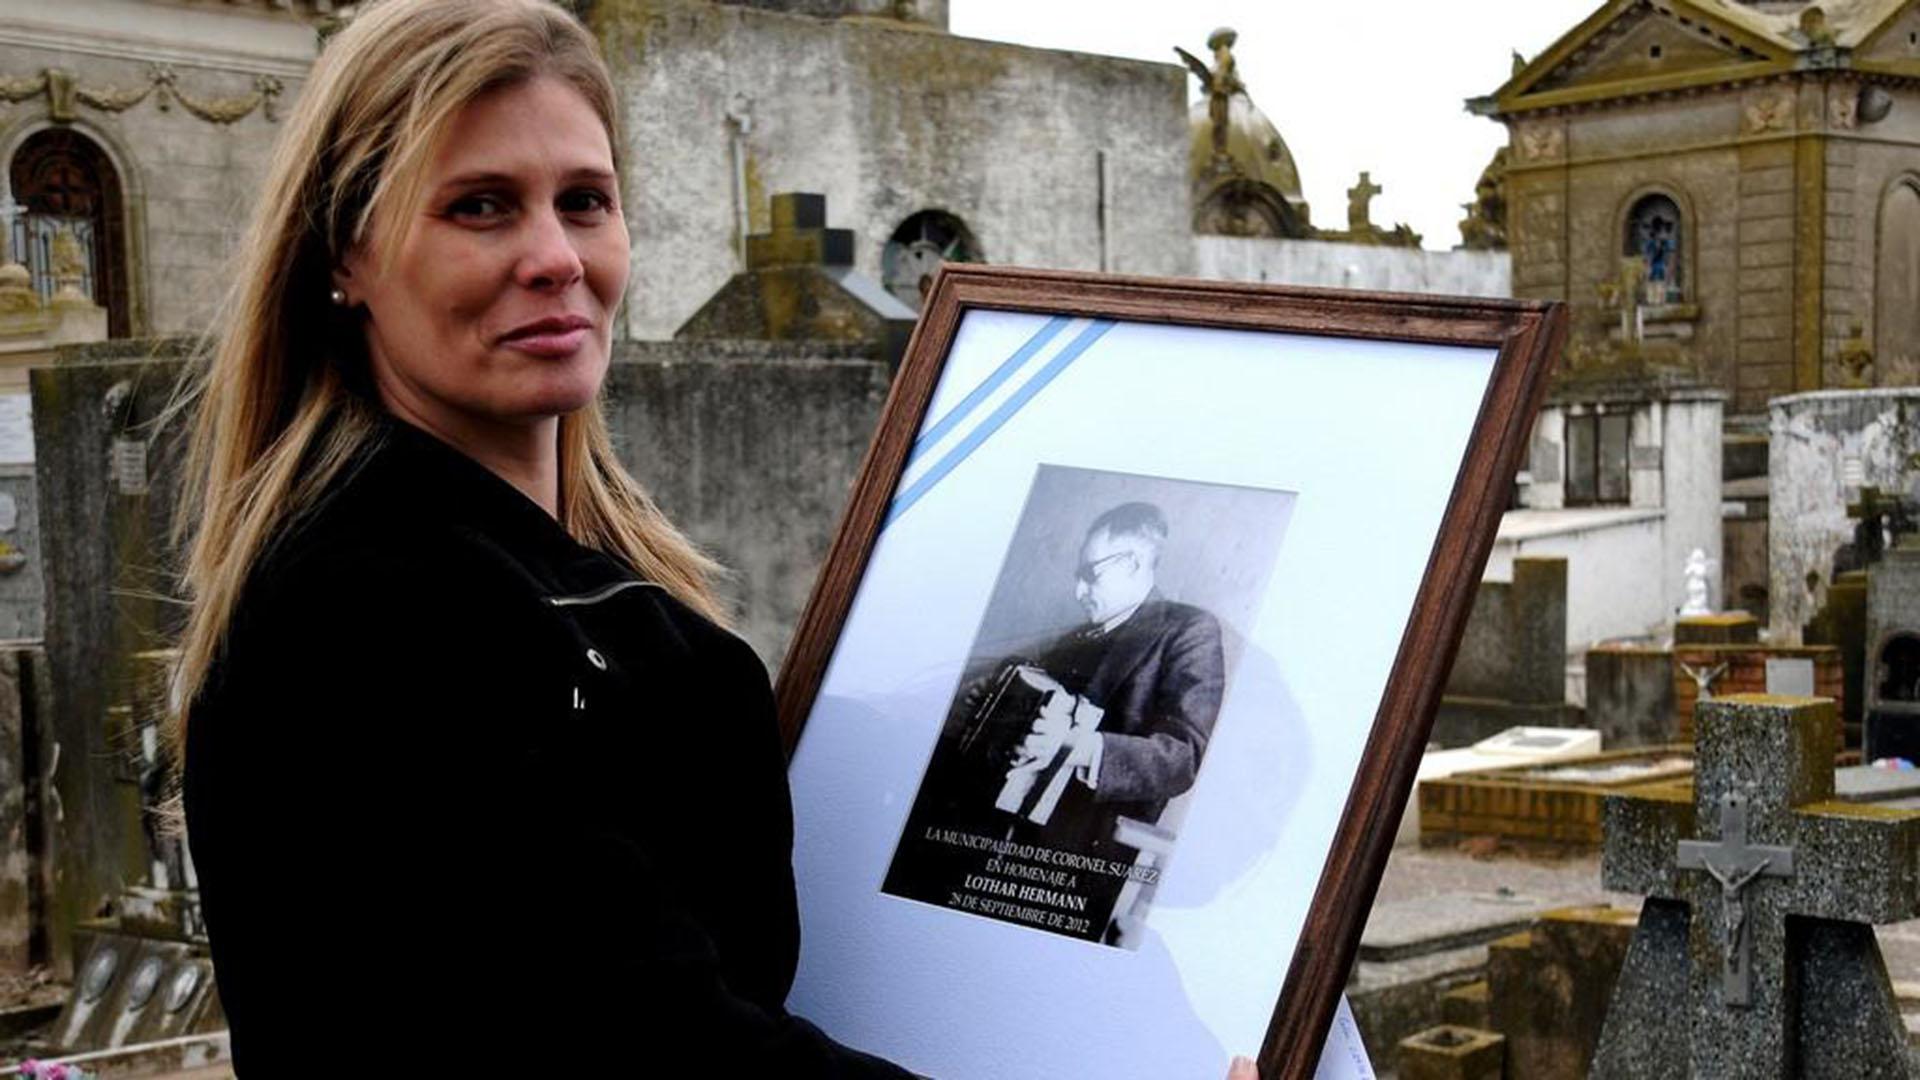 Liliana Hermann, la sobrina nieta del hombre que ayudó a capturar a Eichmann